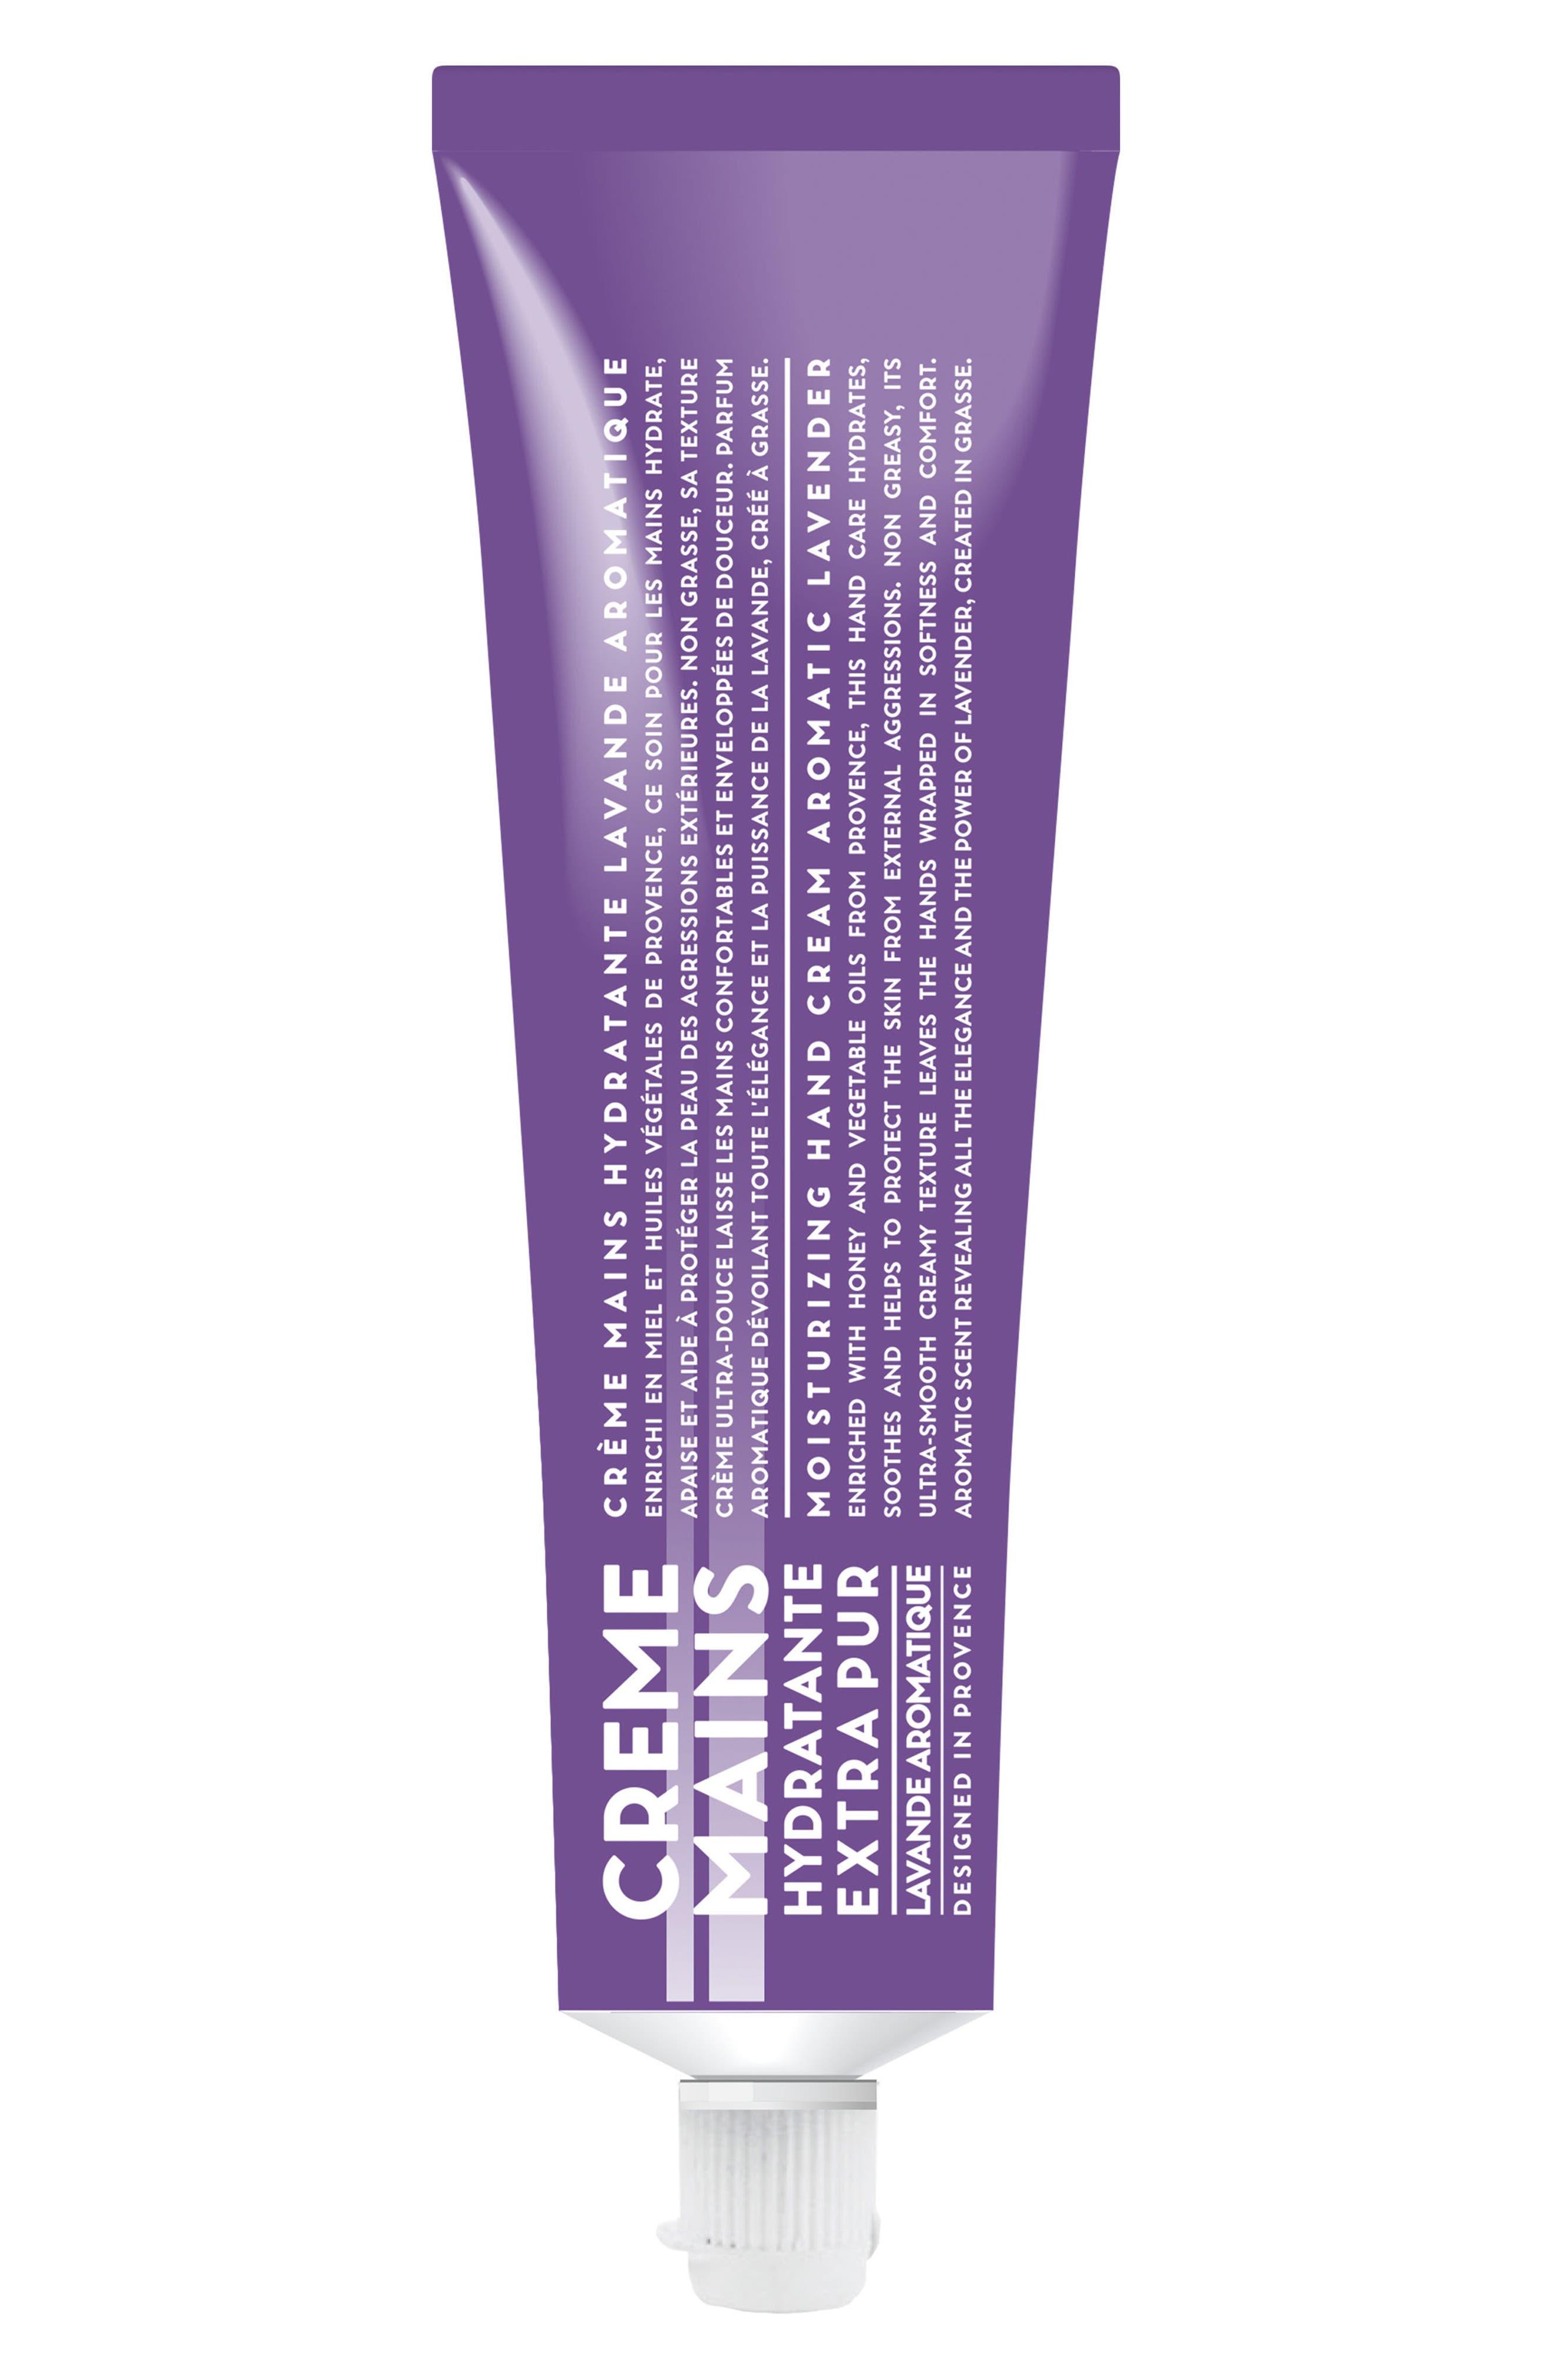 Alternate Image 1 Selected - Compagnie de Provence Aromatic Lavender Moisturizing Hand Cream